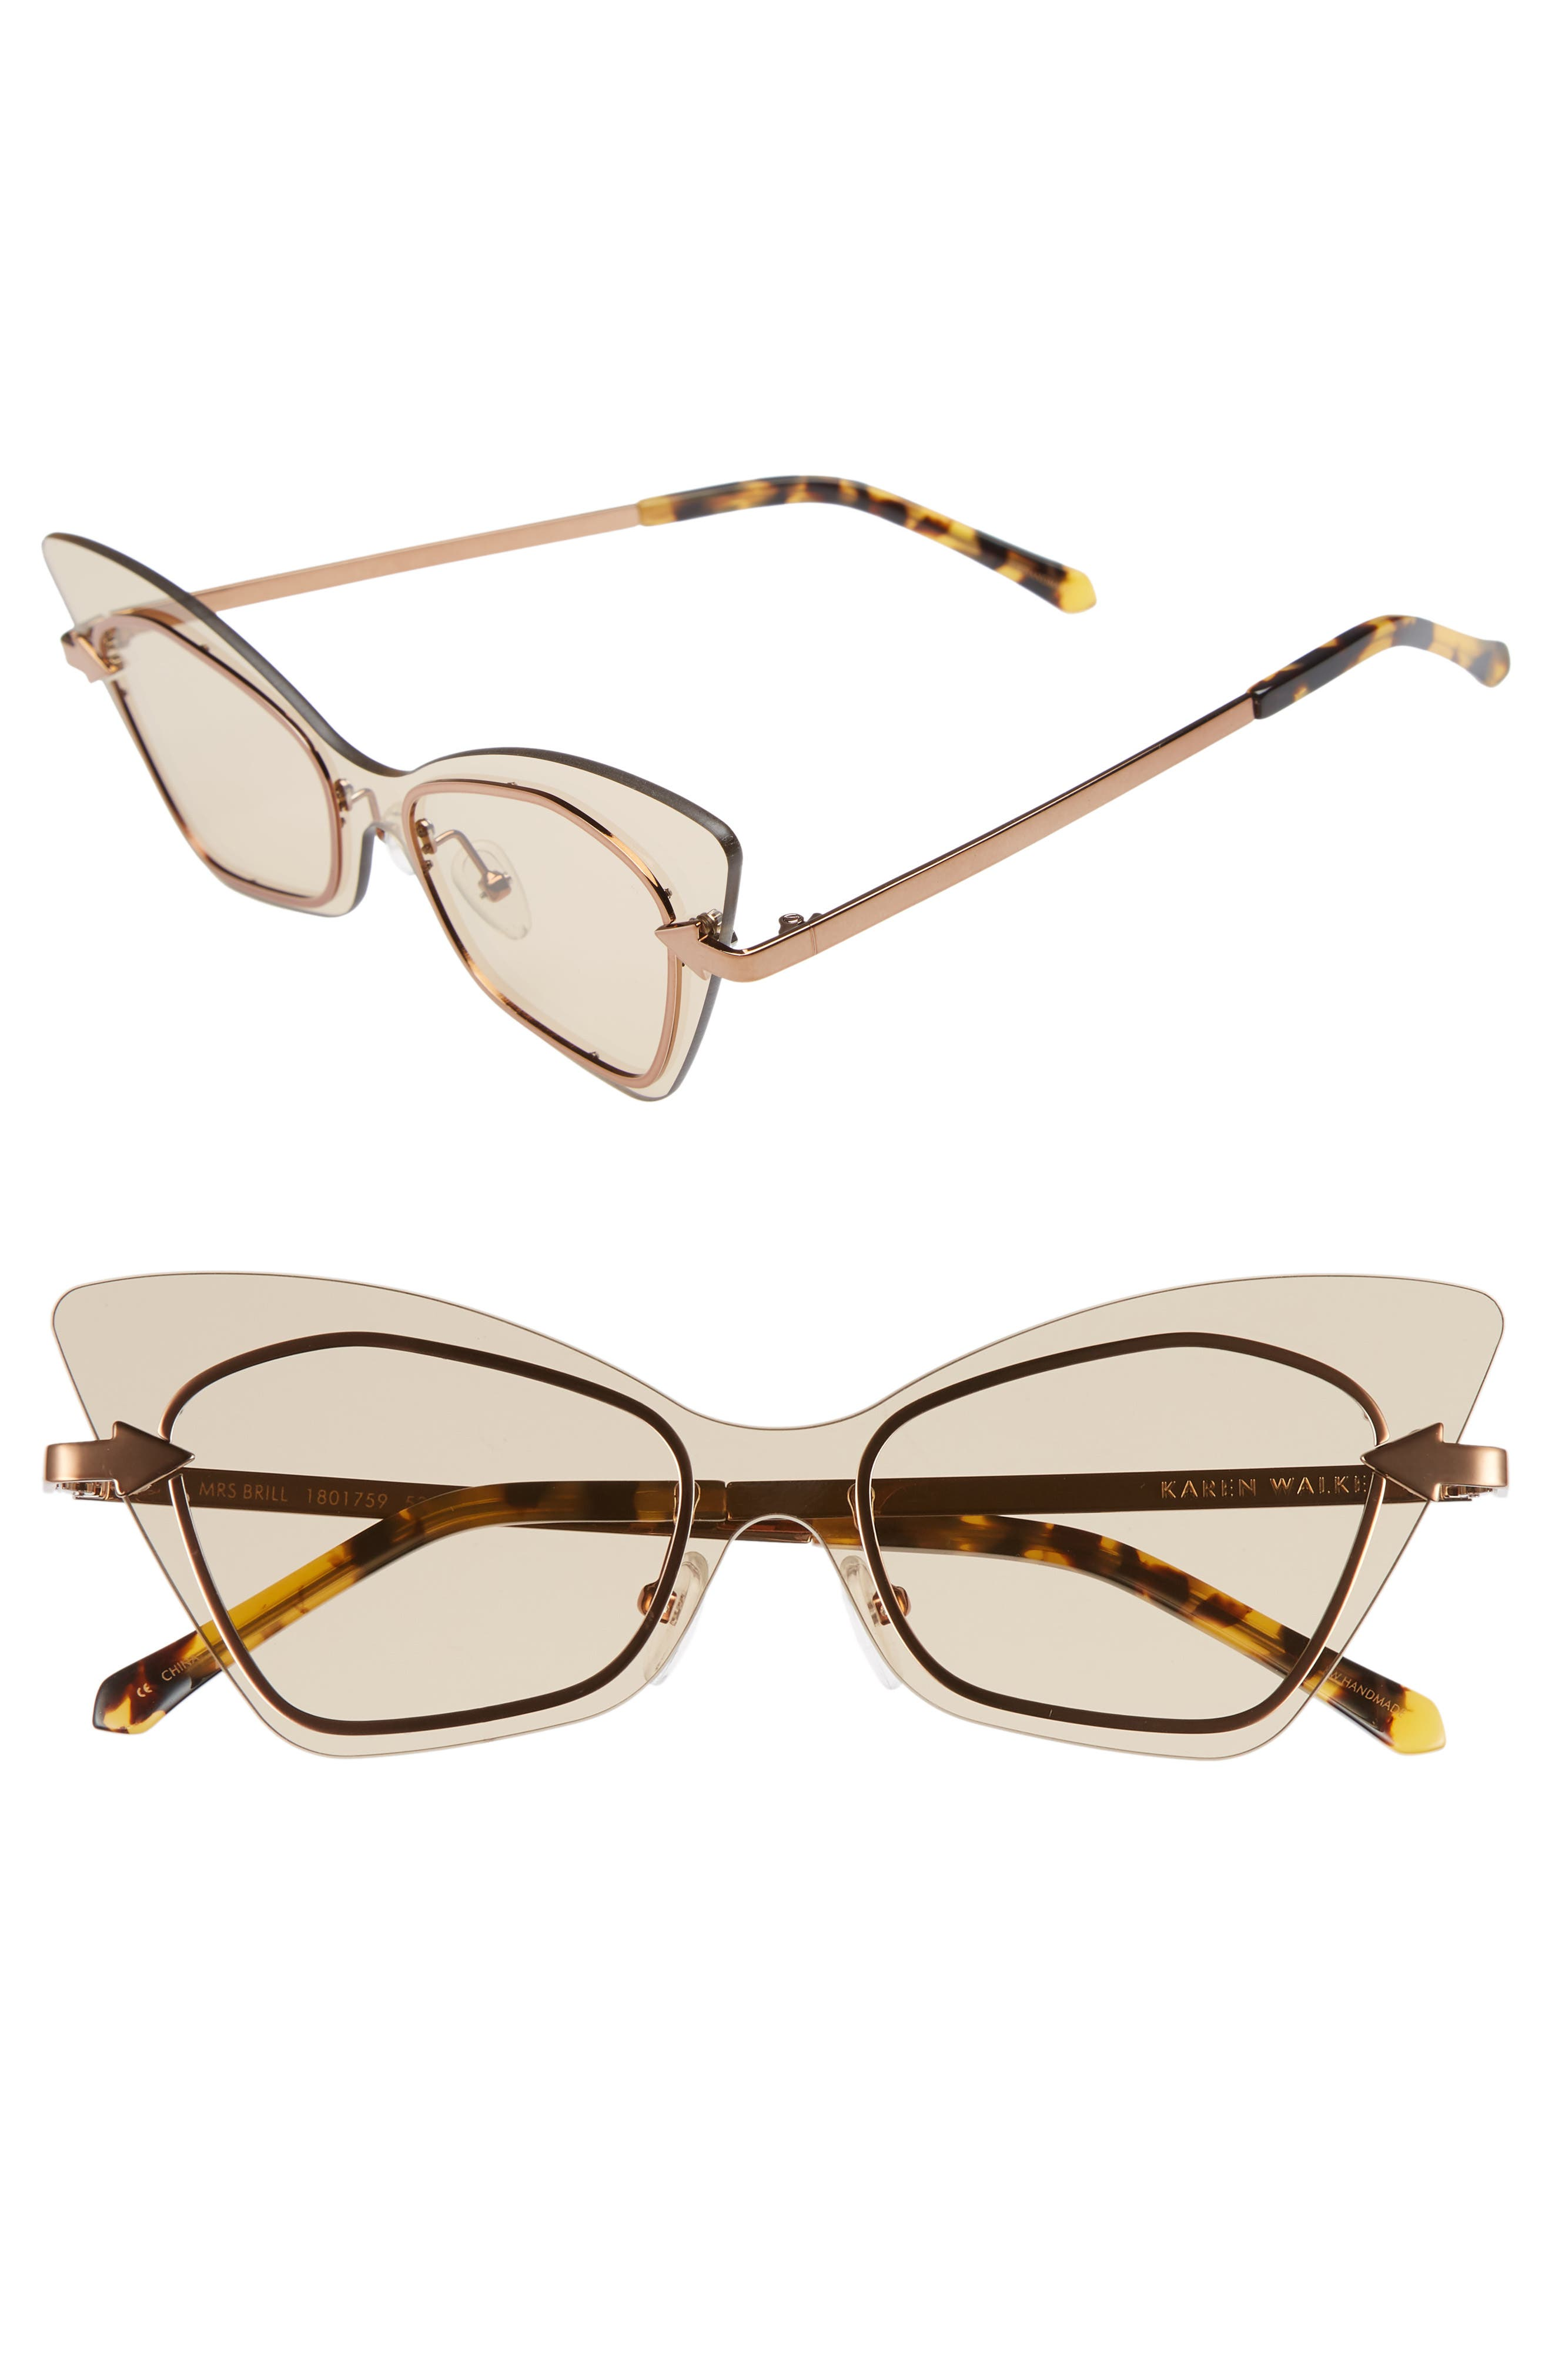 Mrs. Brill 53mm Cat Eye Sunglasses,                         Main,                         color, Crazy Tortoise